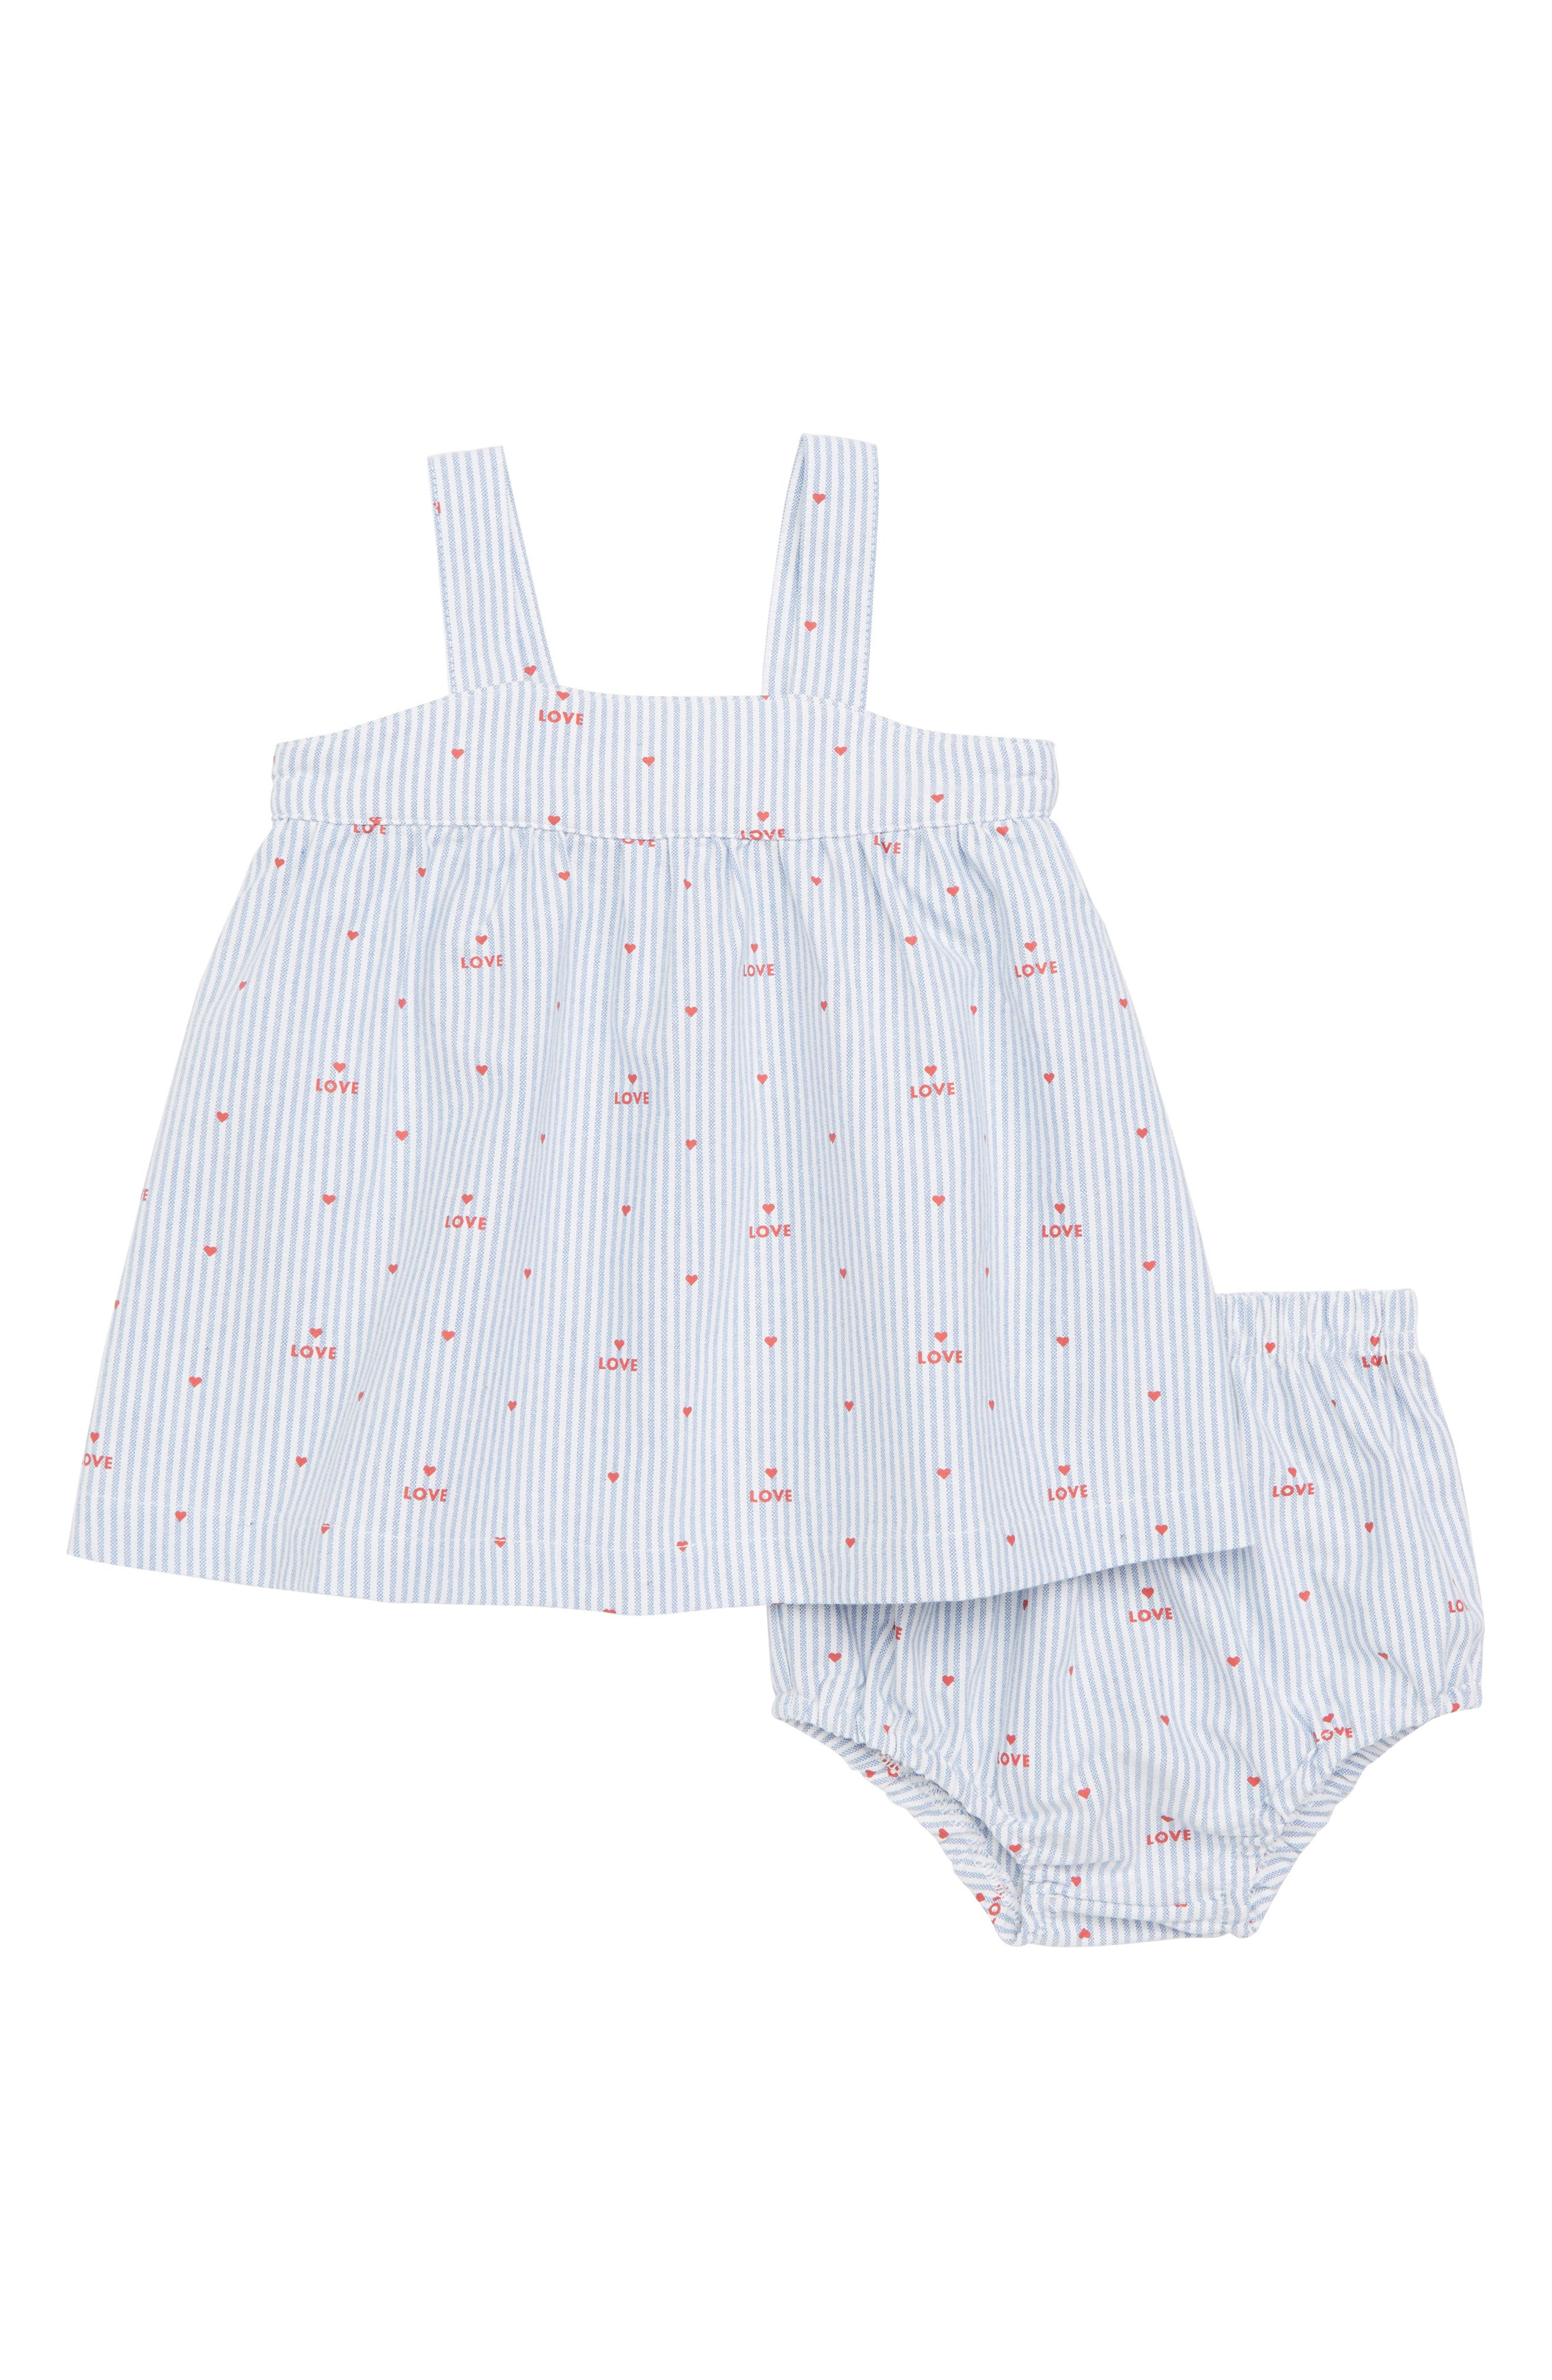 Pinstripe Swing Dress,                             Main thumbnail 1, color,                             White/ Peach